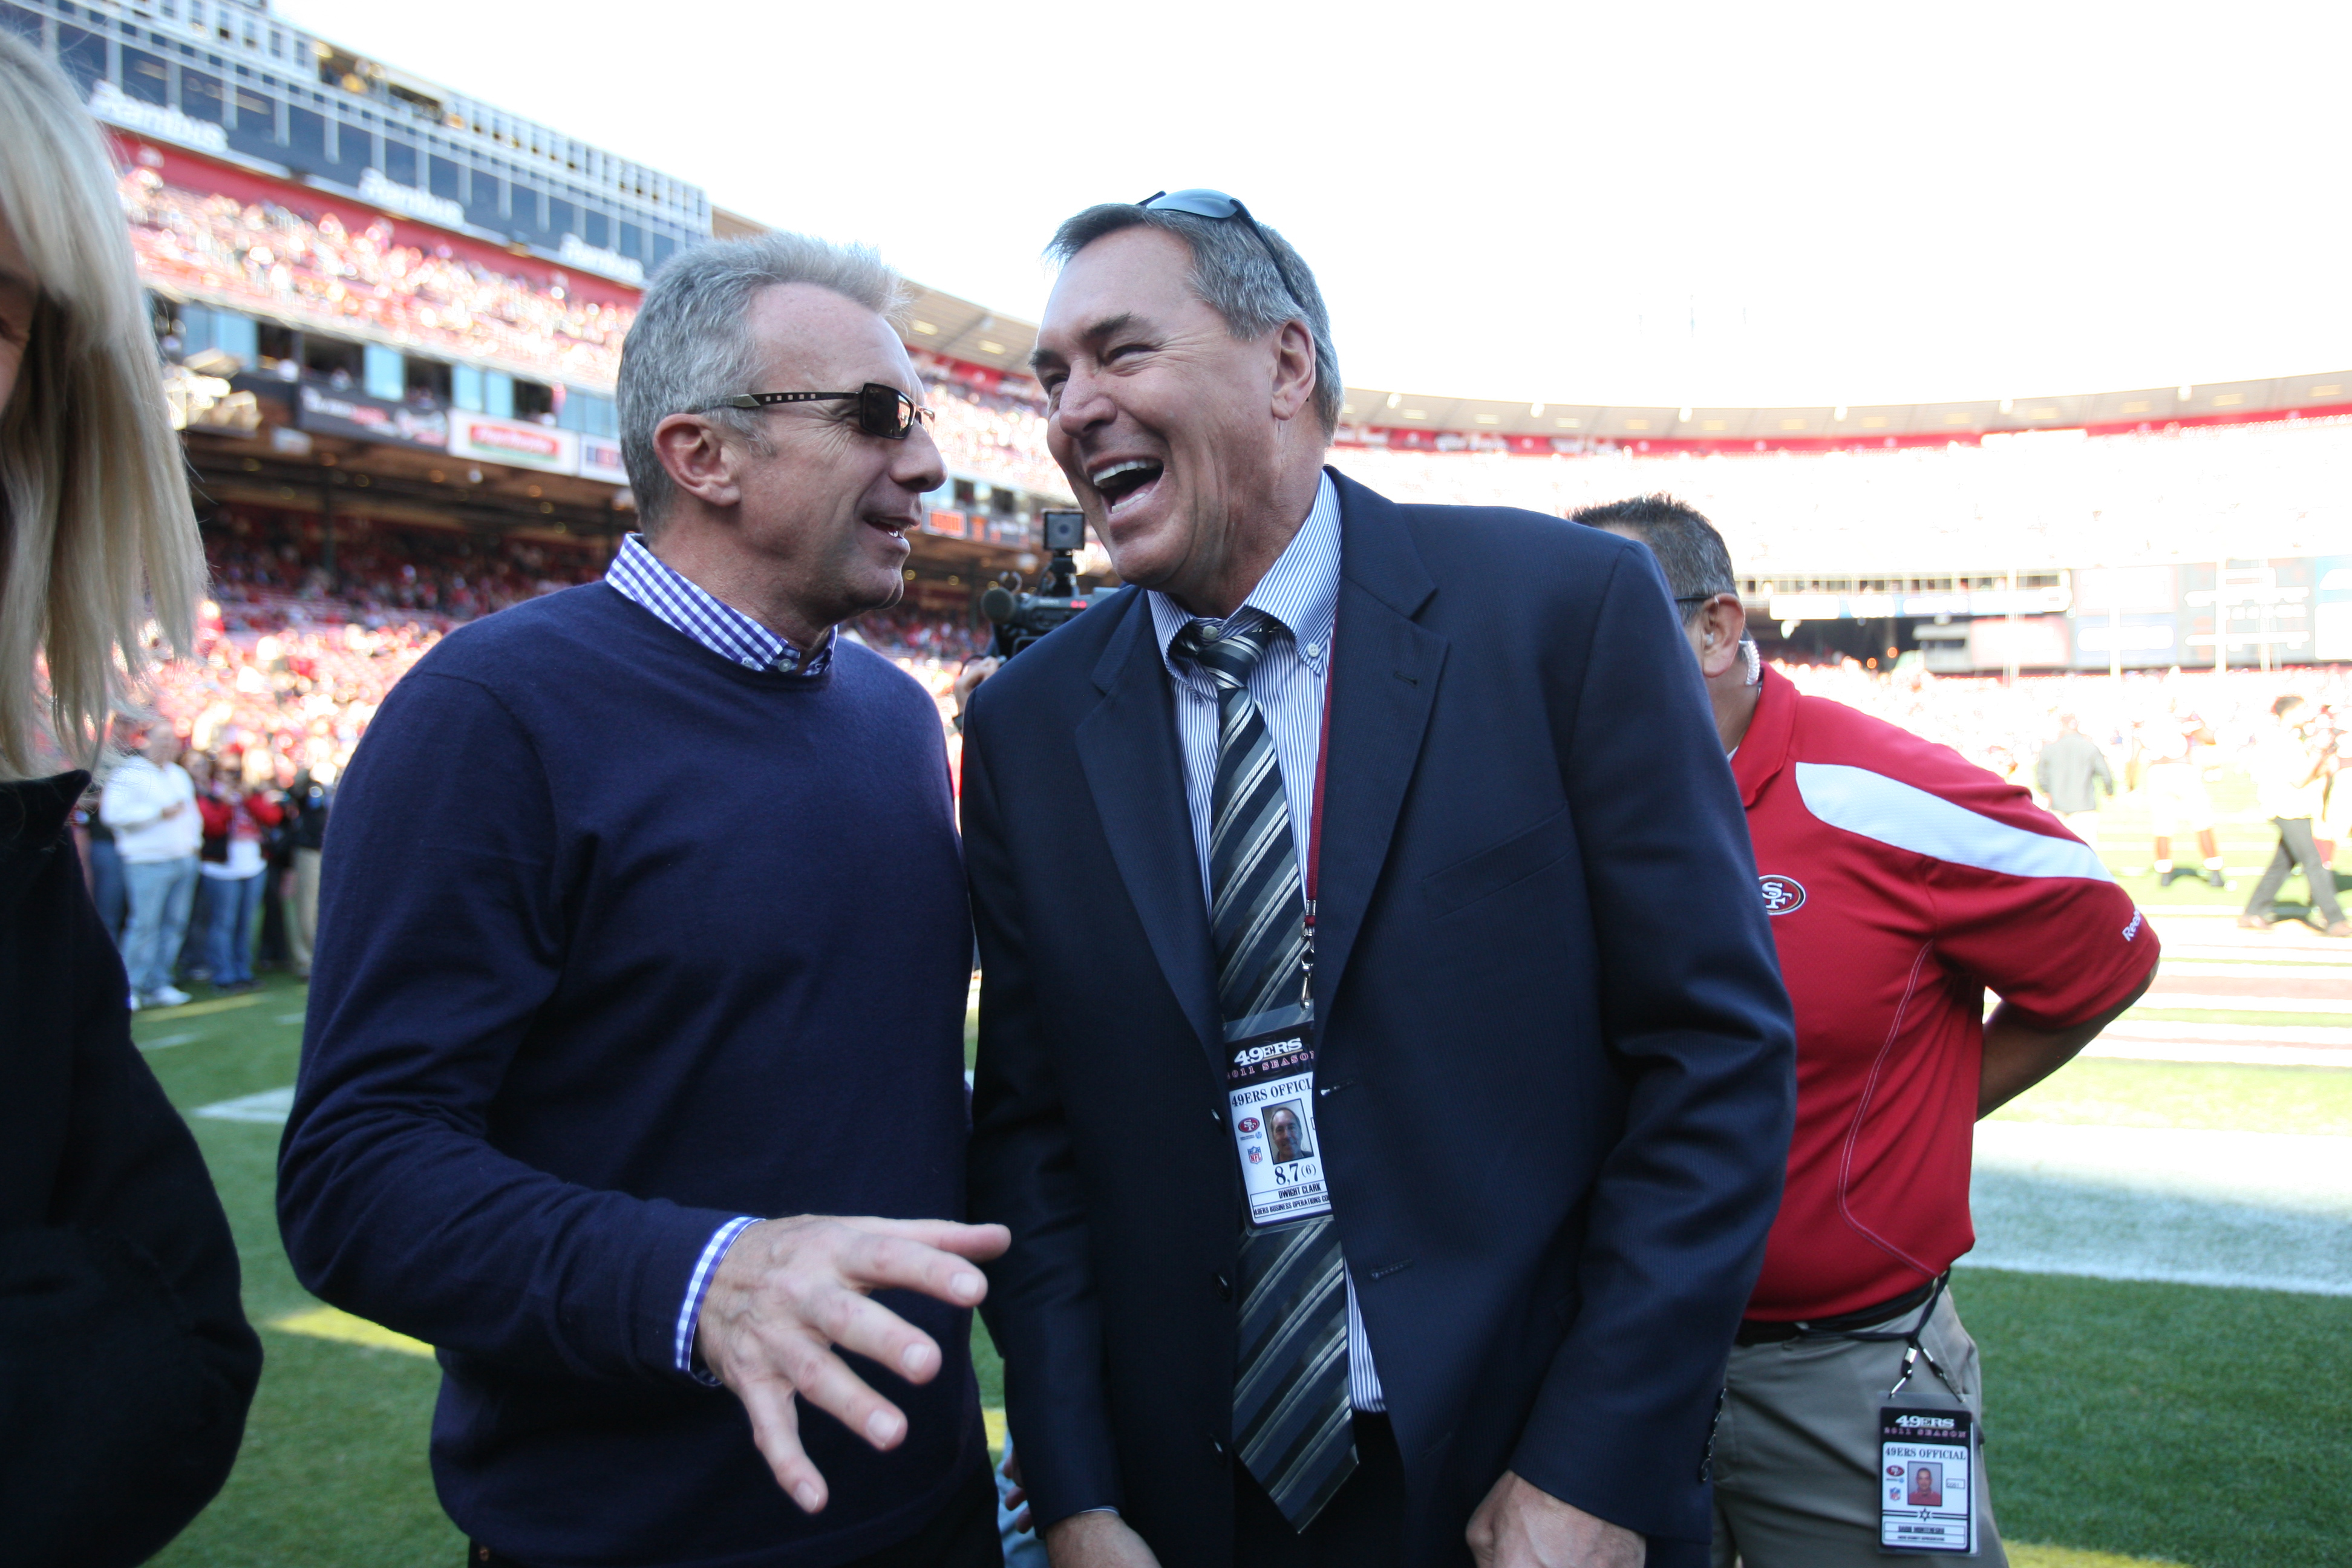 Former 49ers Legend Dwight Clark Announces He Has Als